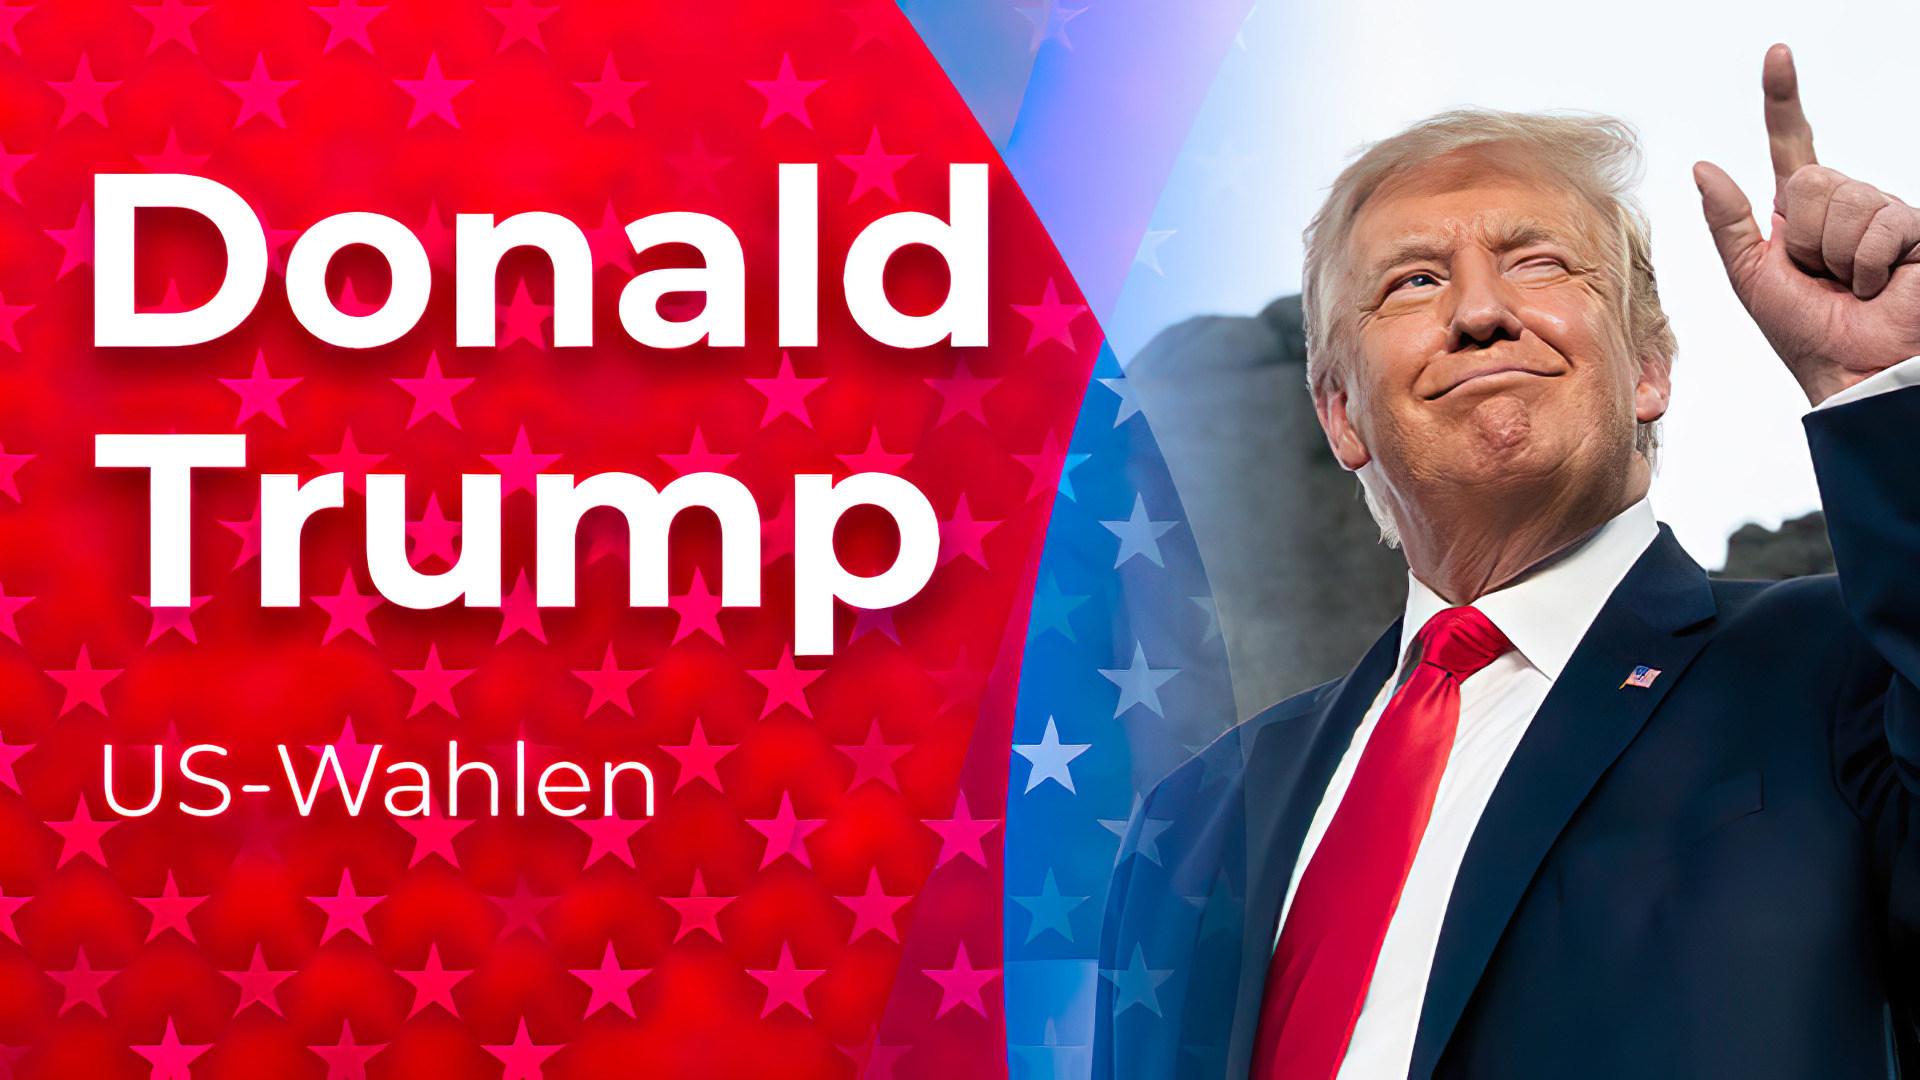 Usa, trump, Donald Trump, Präsident, US-Präsident, Weißes Haus, US-Wahl, US-Wahlen, US-Wahlen 2020, USA 2020